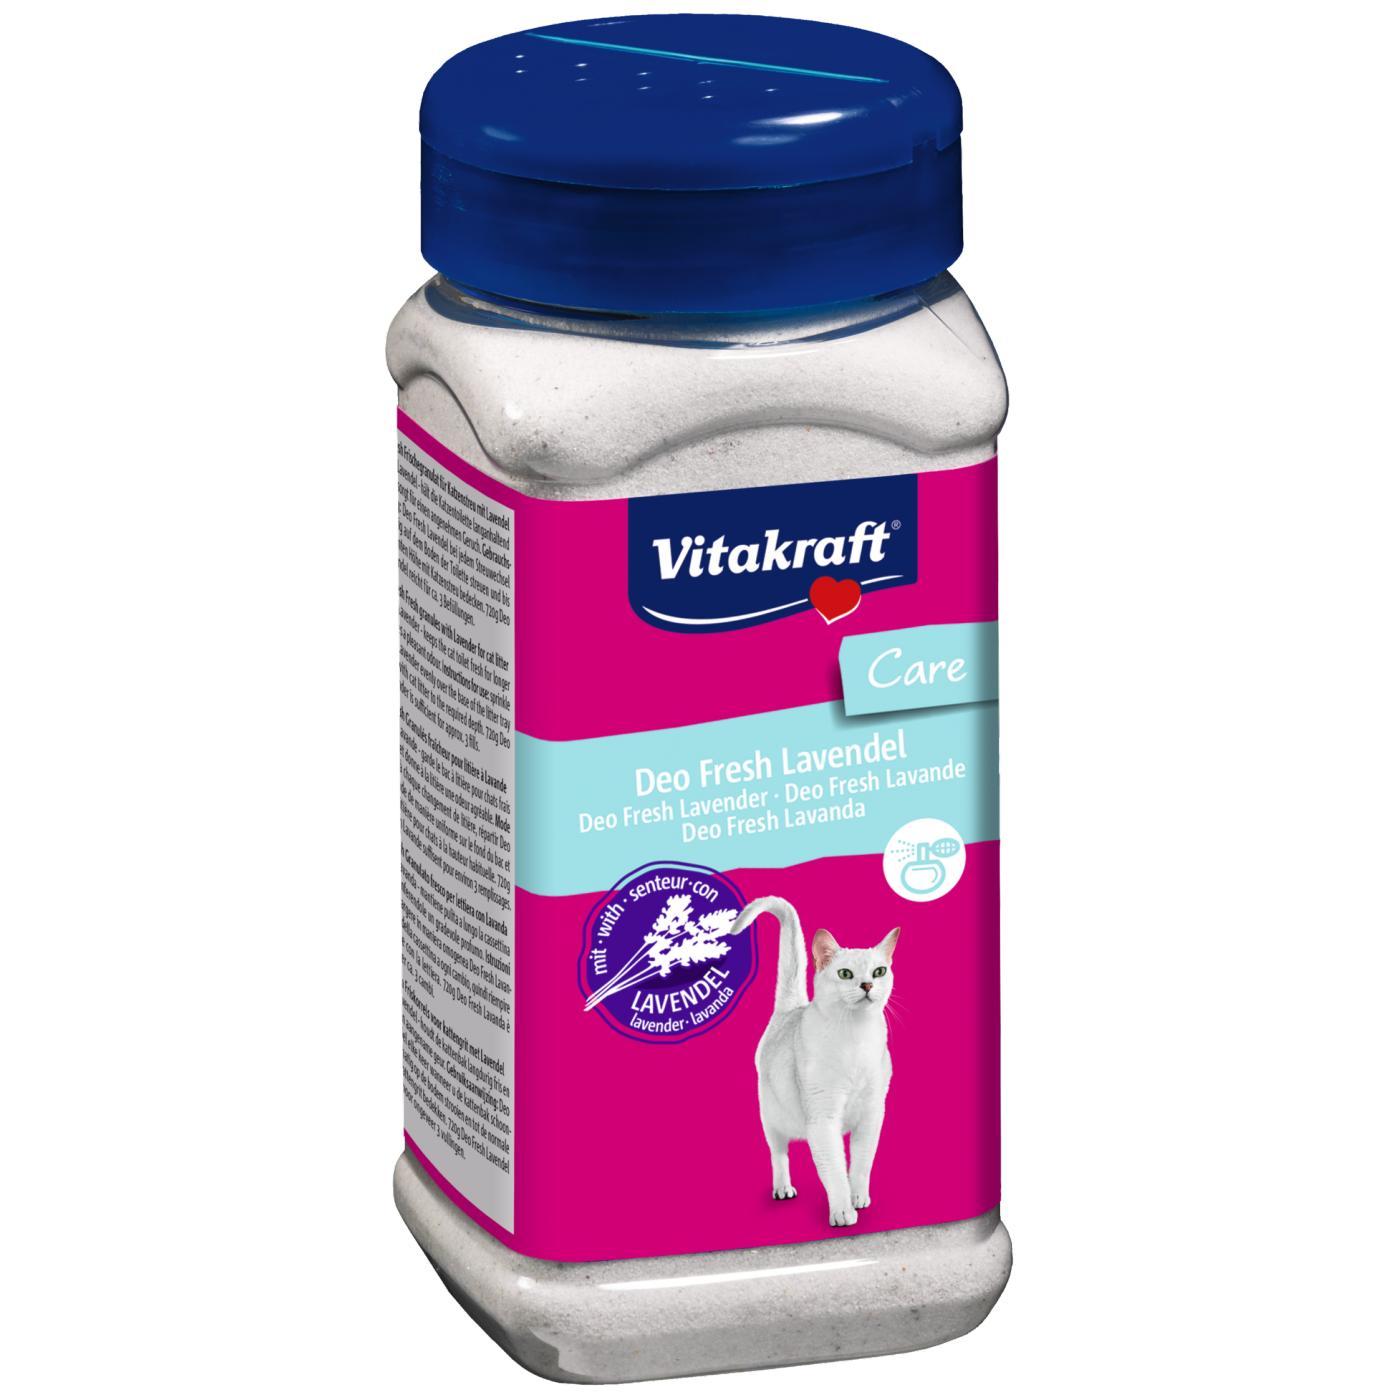 Vitakraft Deo Fresh levandule 720 g